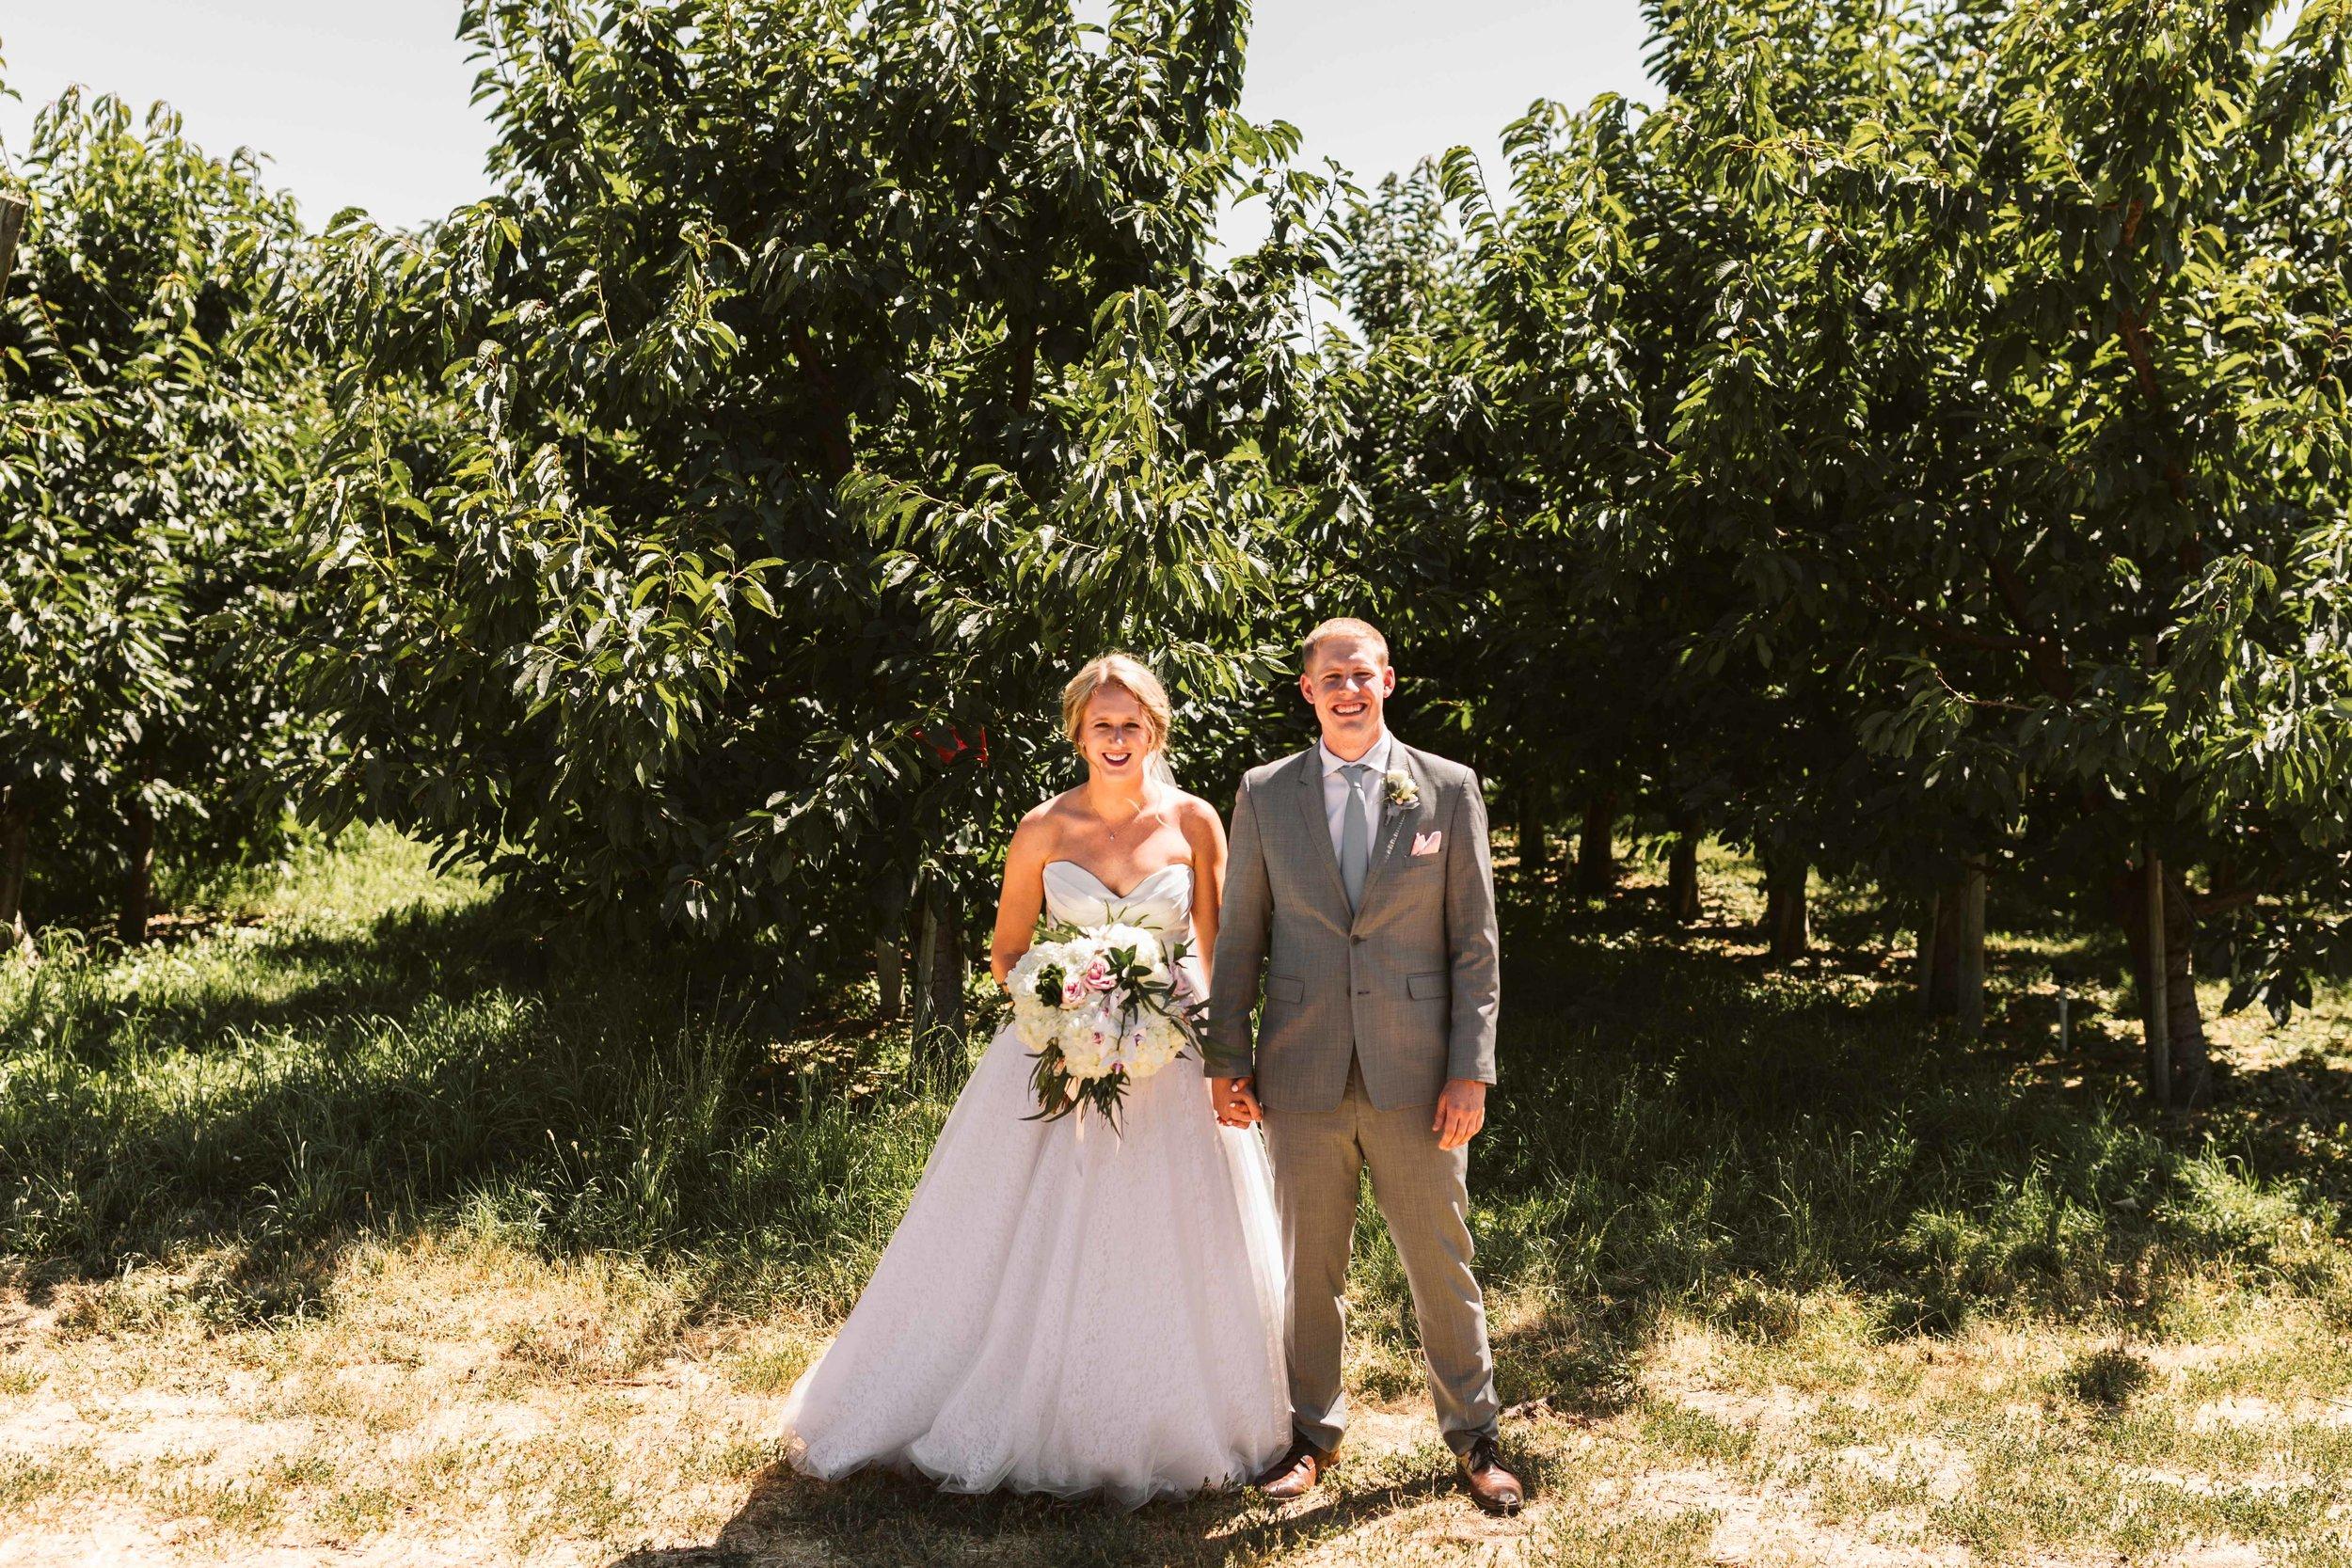 fontaine-estates-wedding-36.jpg